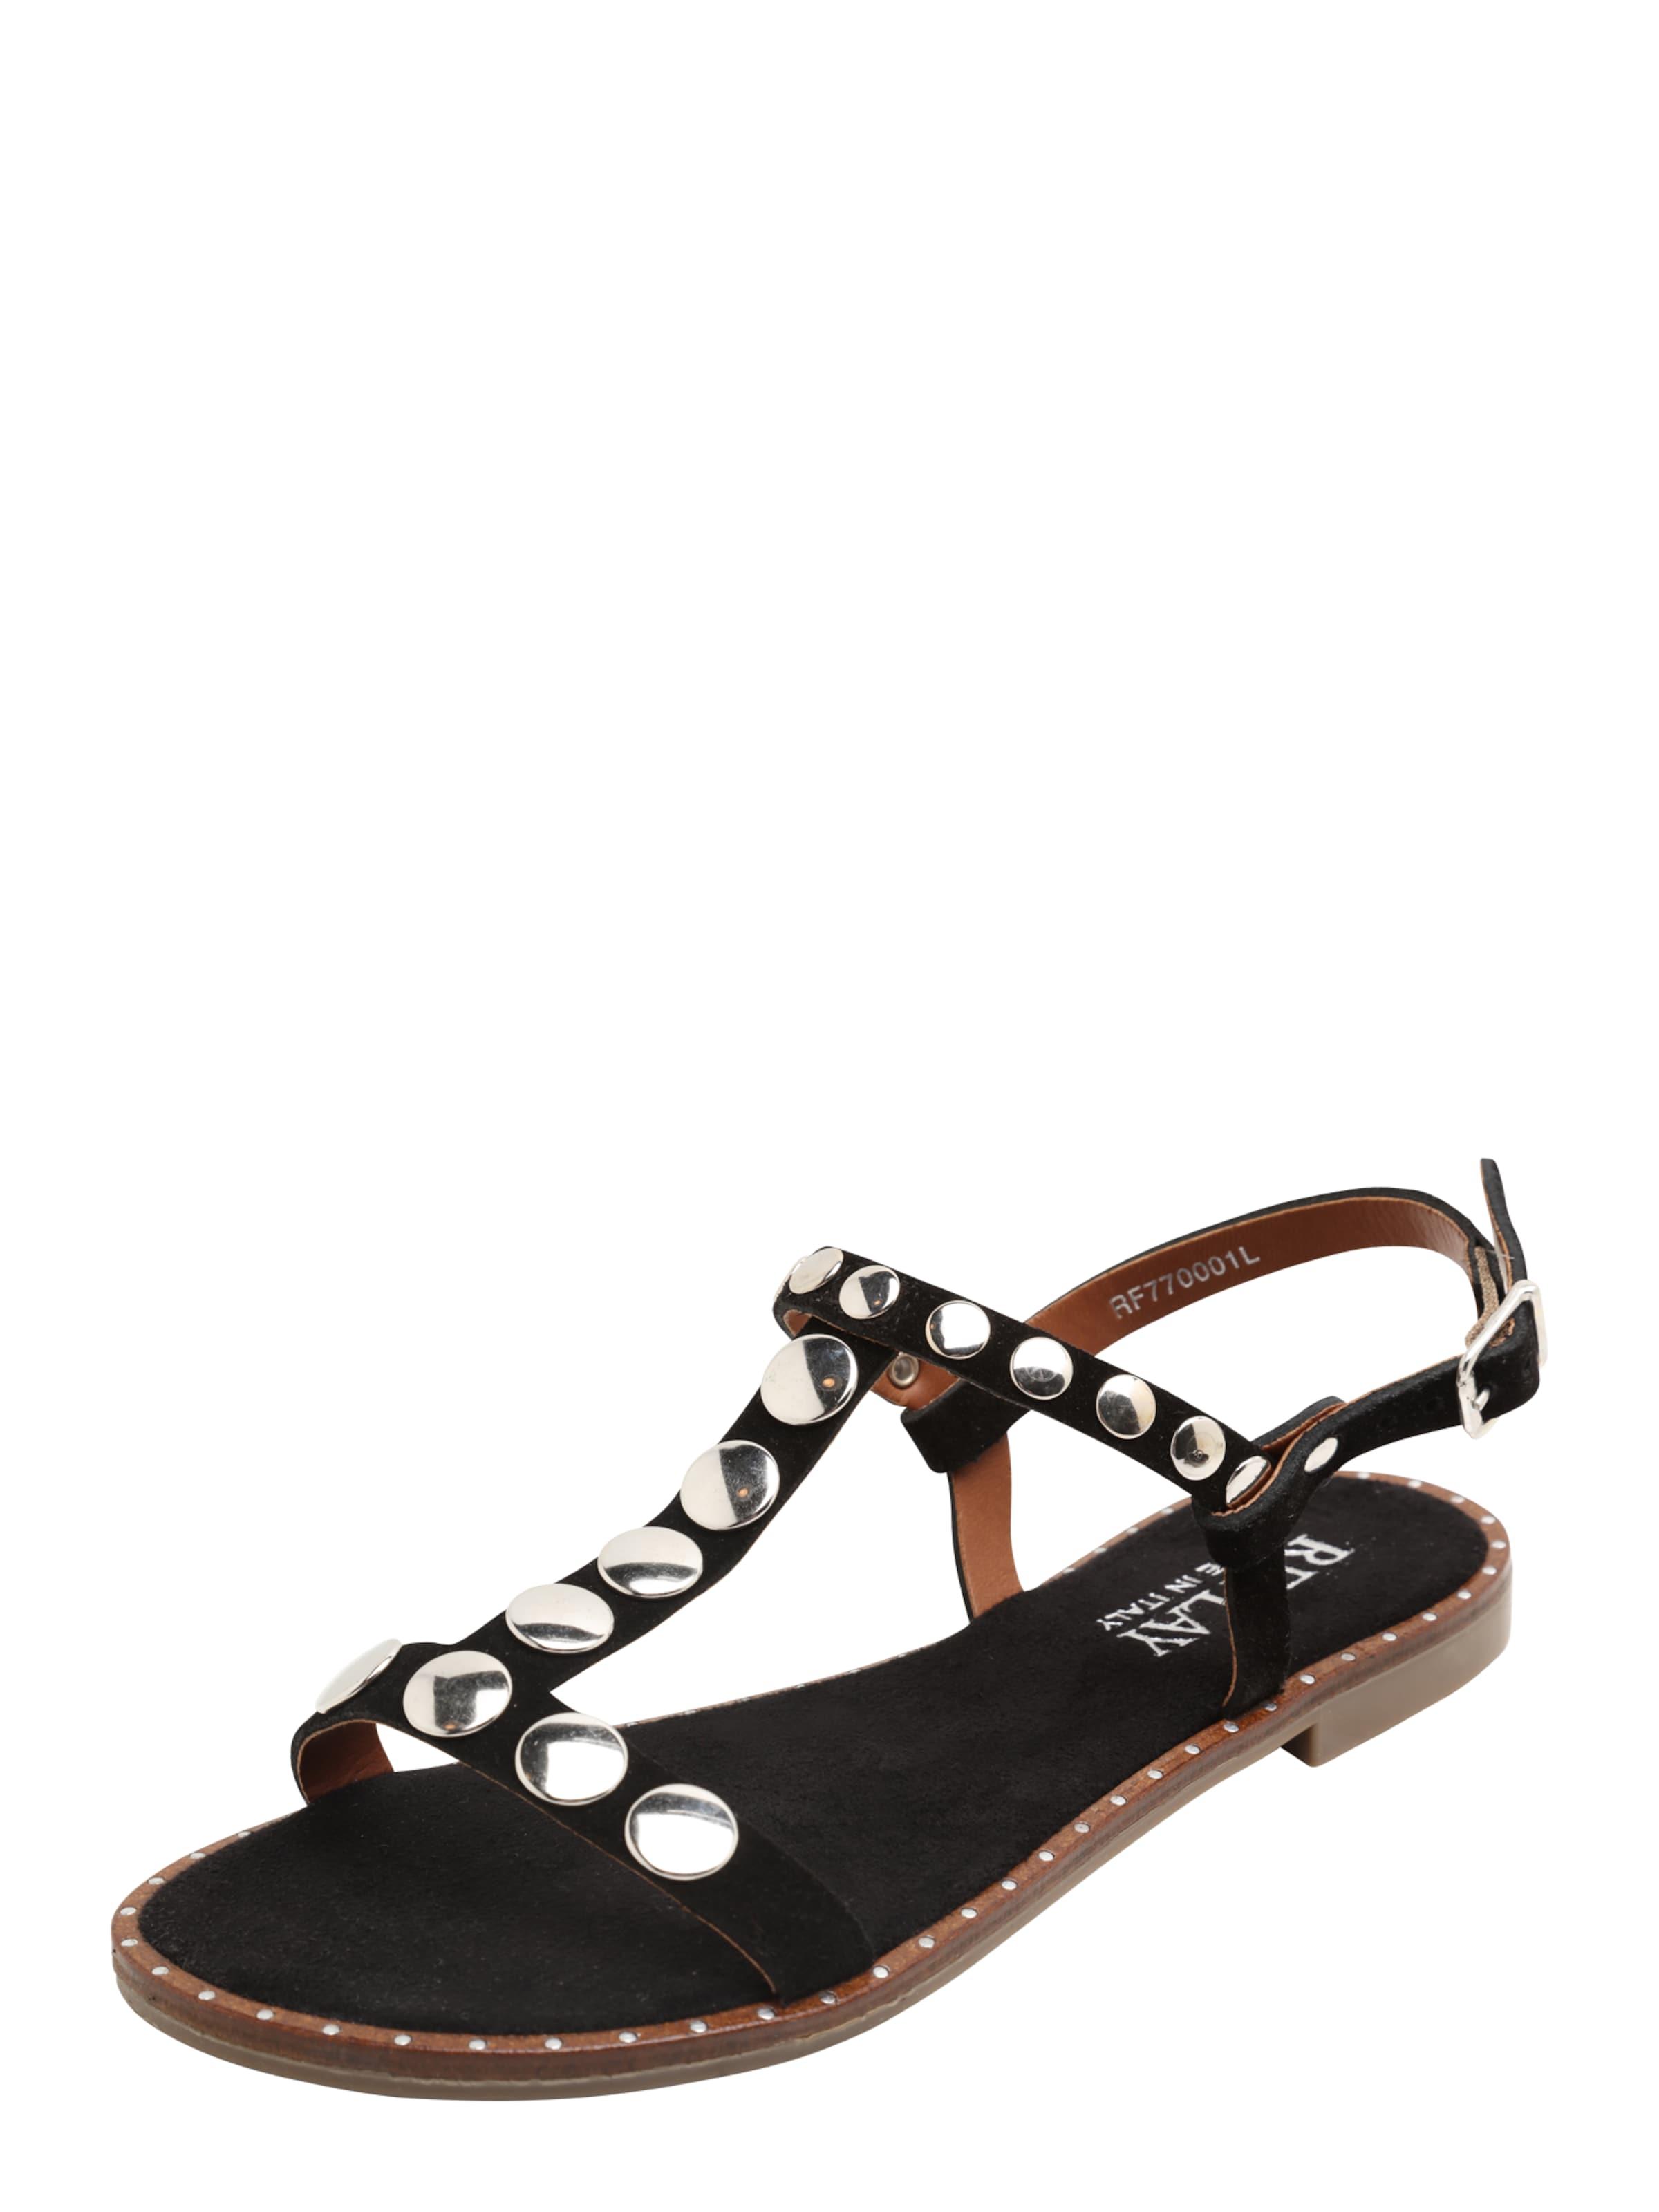 Haltbare Mode billige Schuhe REPLAY | Riemchensandale 'DEVOTA' Schuhe Gut getragene Schuhe